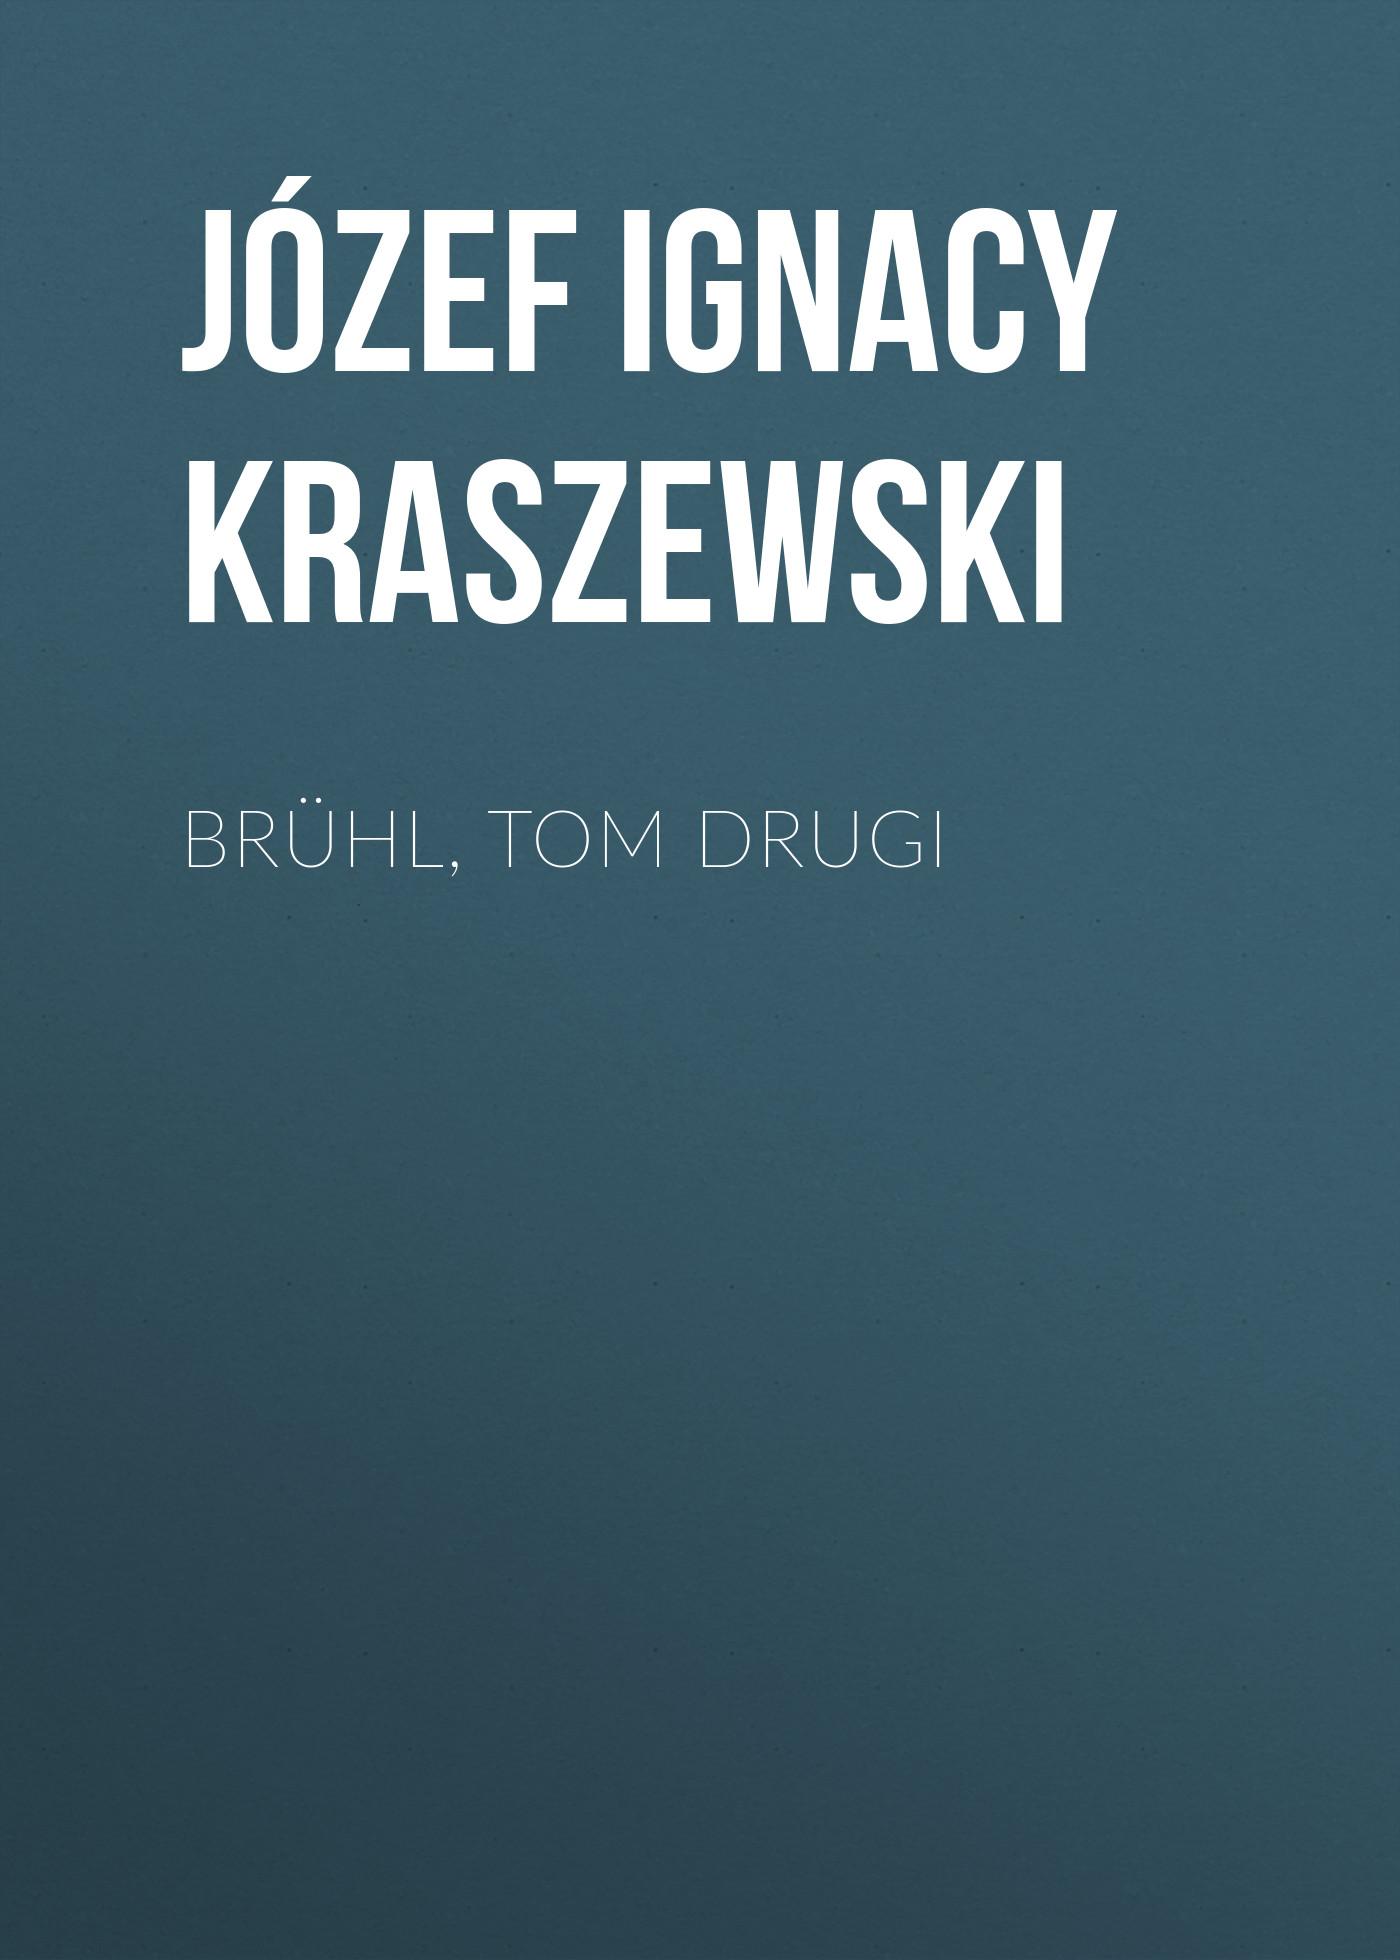 Brühl, tom drugi